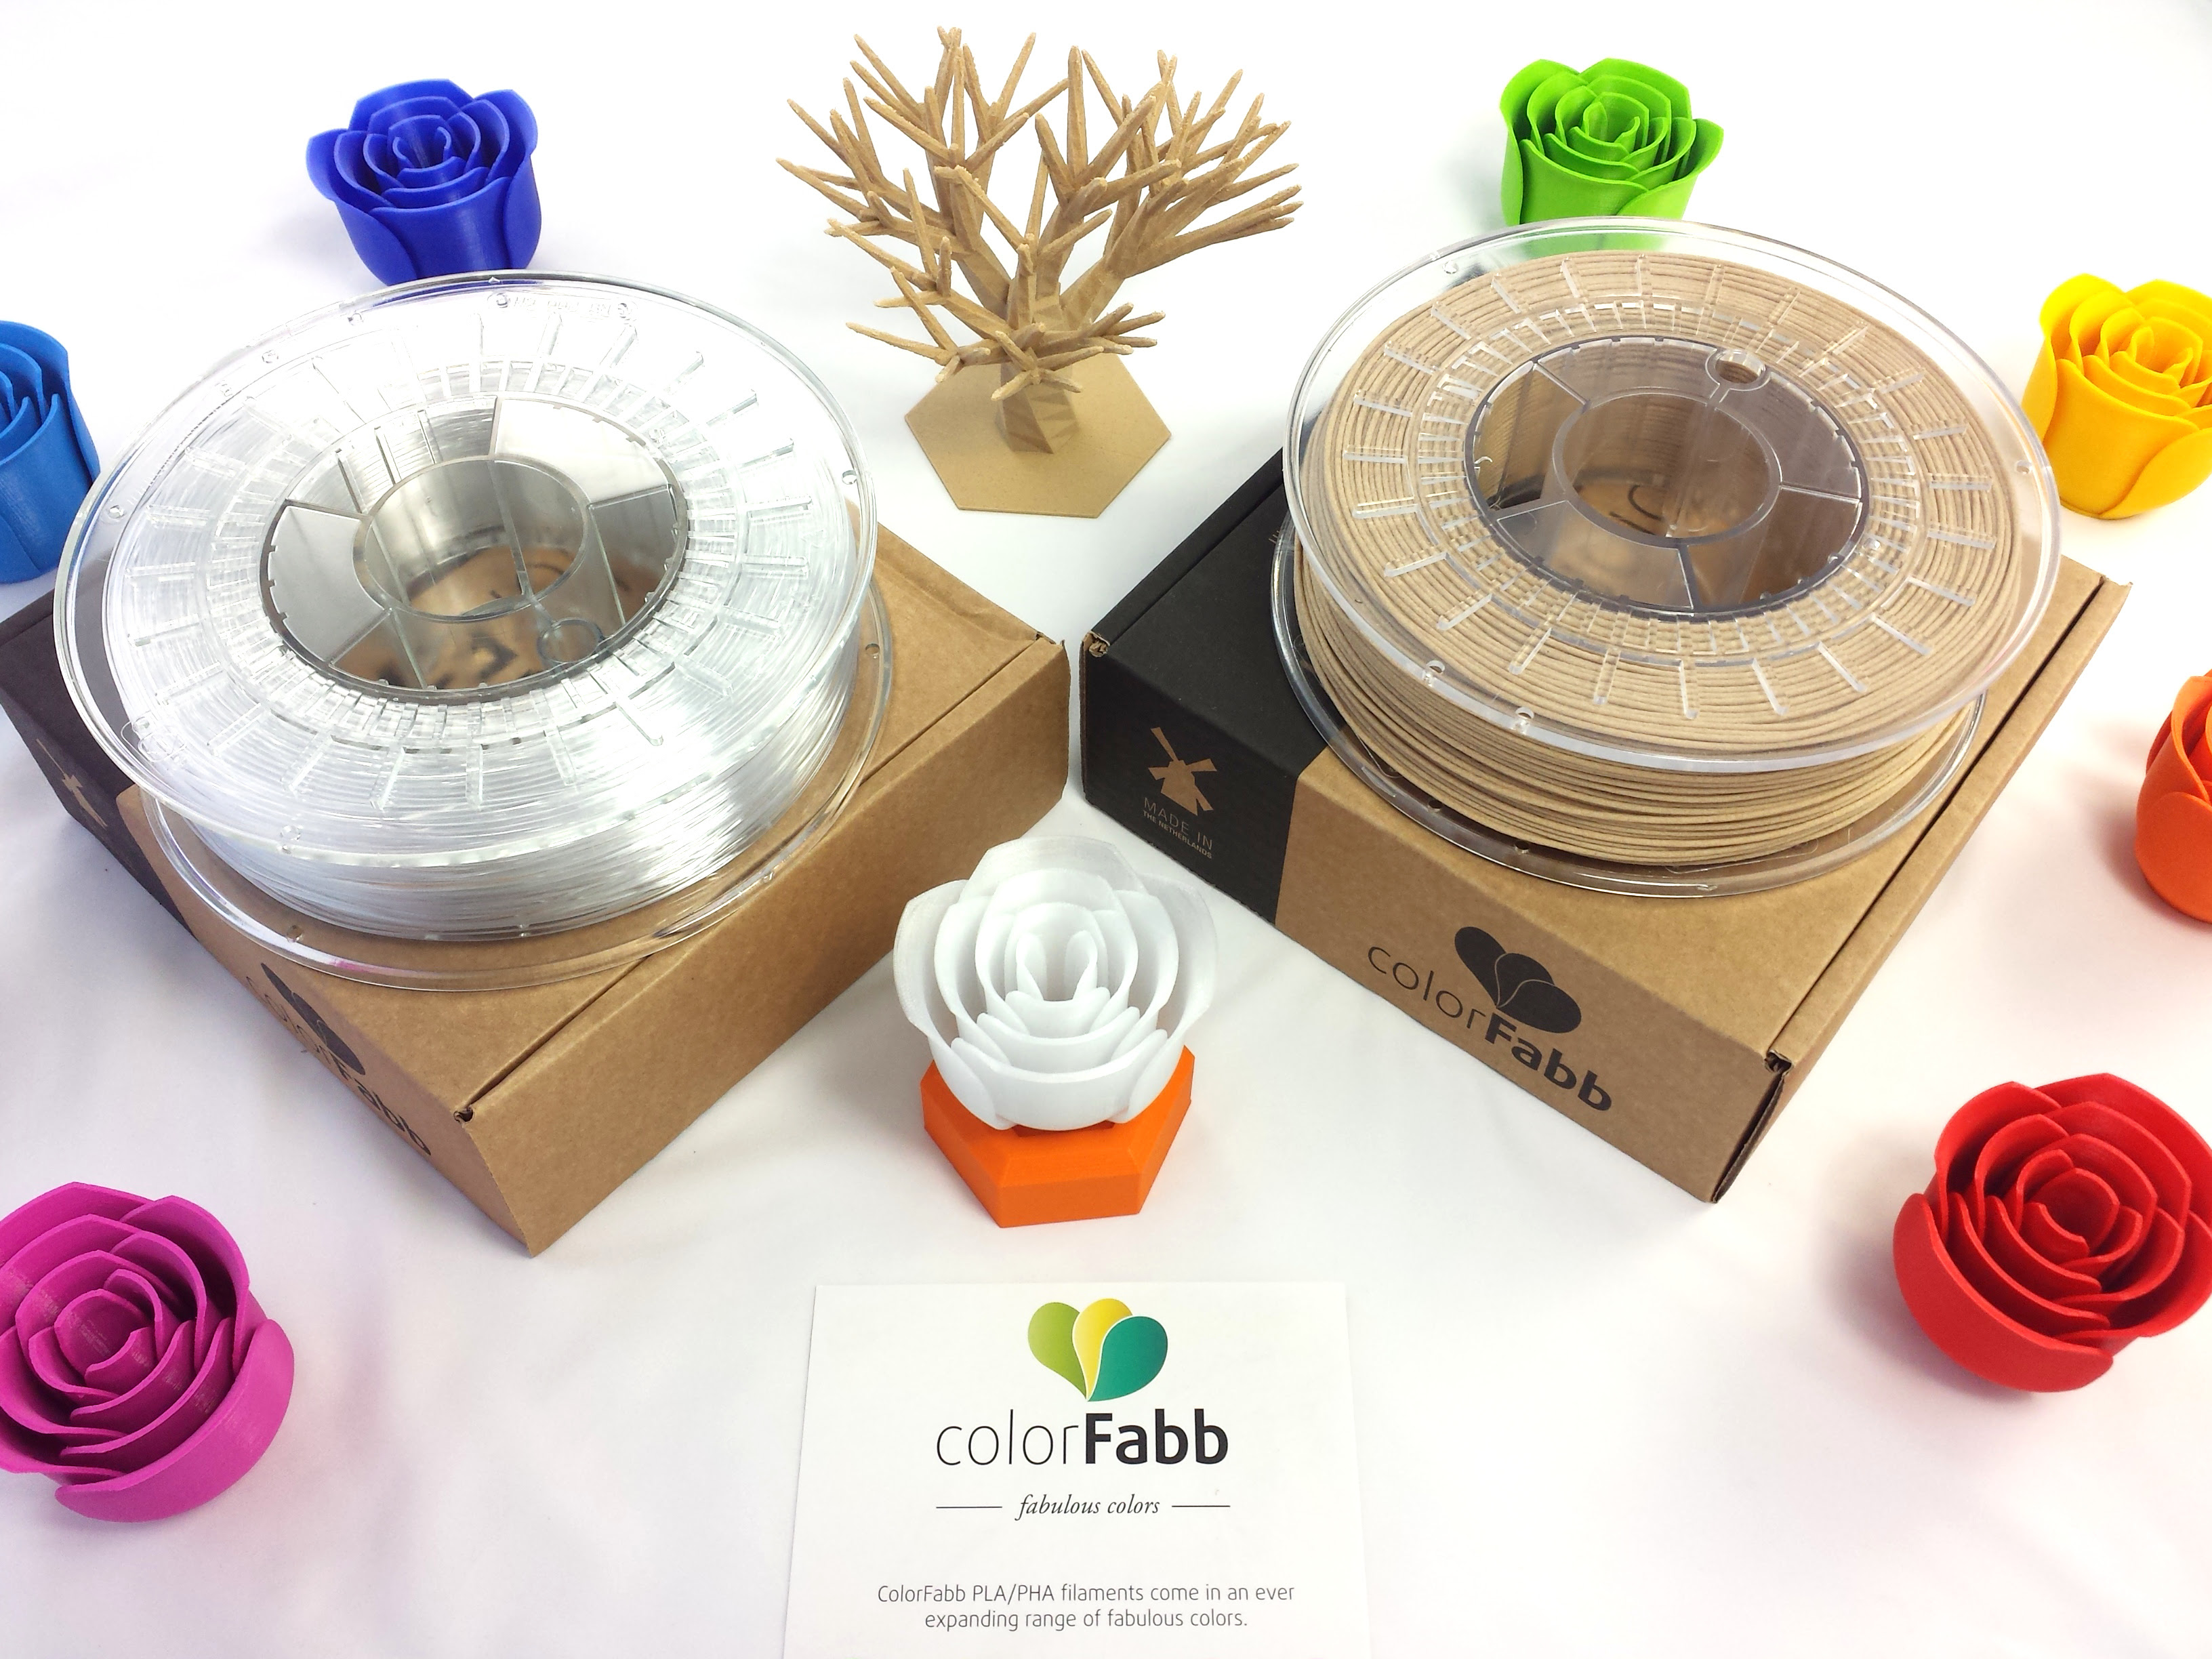 ColorFabb Woodfill Fine, _XT, PLA/PHA